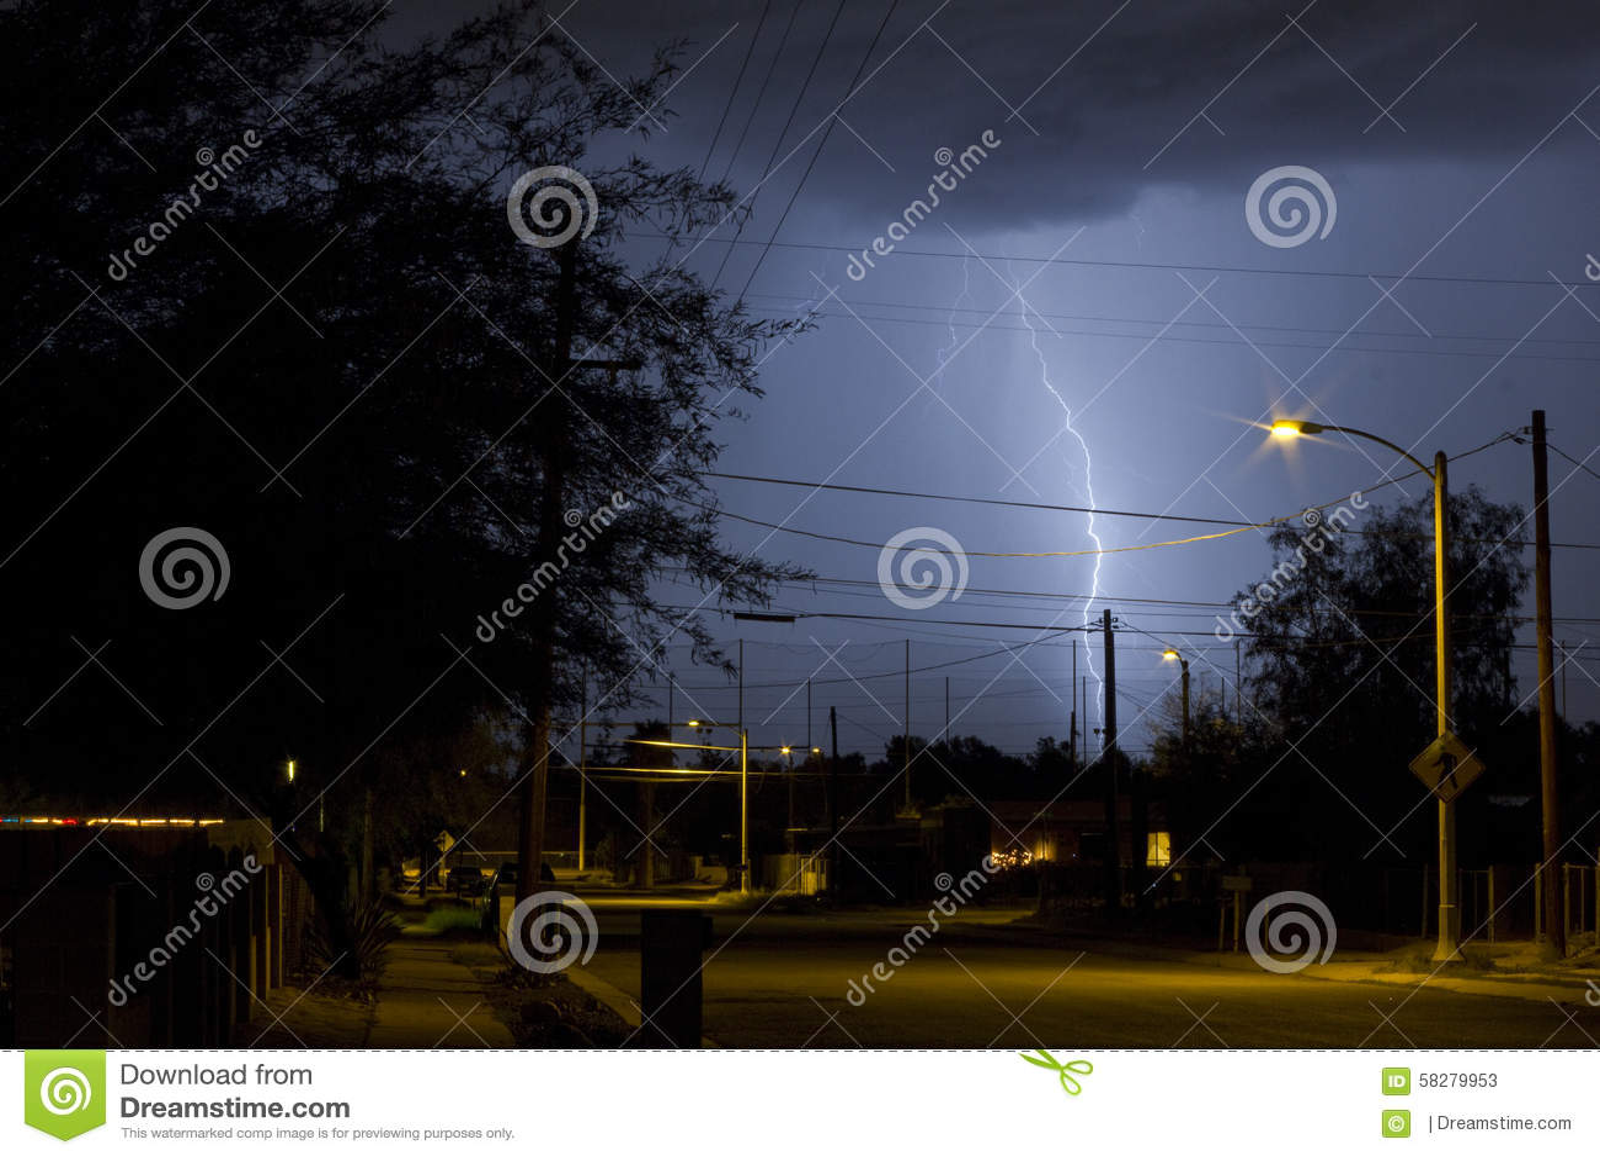 tucson arizona street at night during a lightning storm stock image